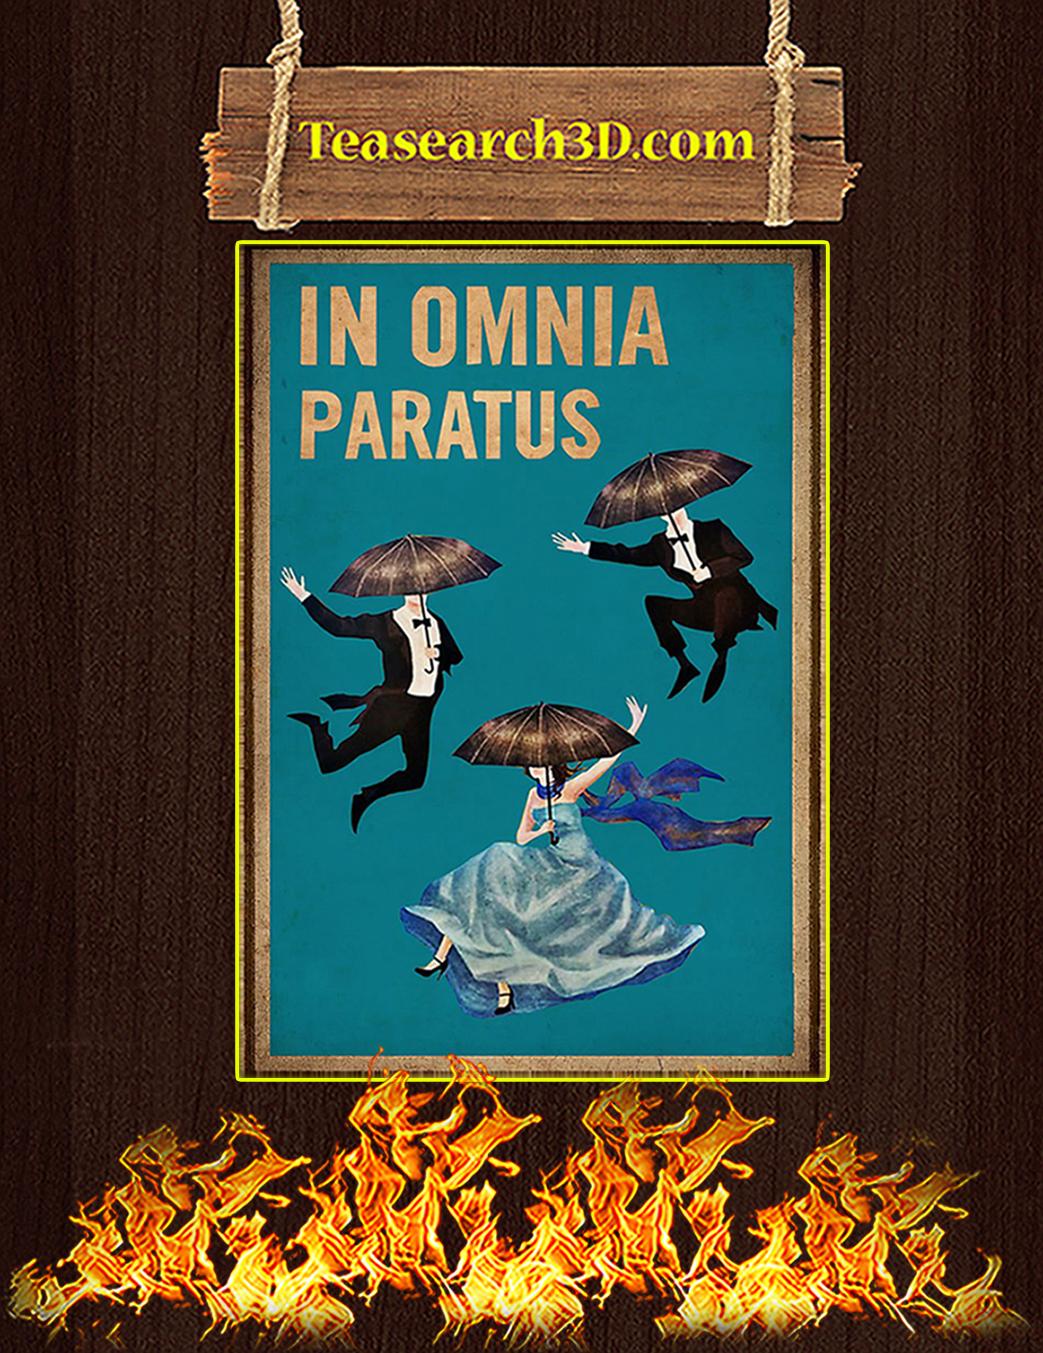 In omnia paratus poster A1